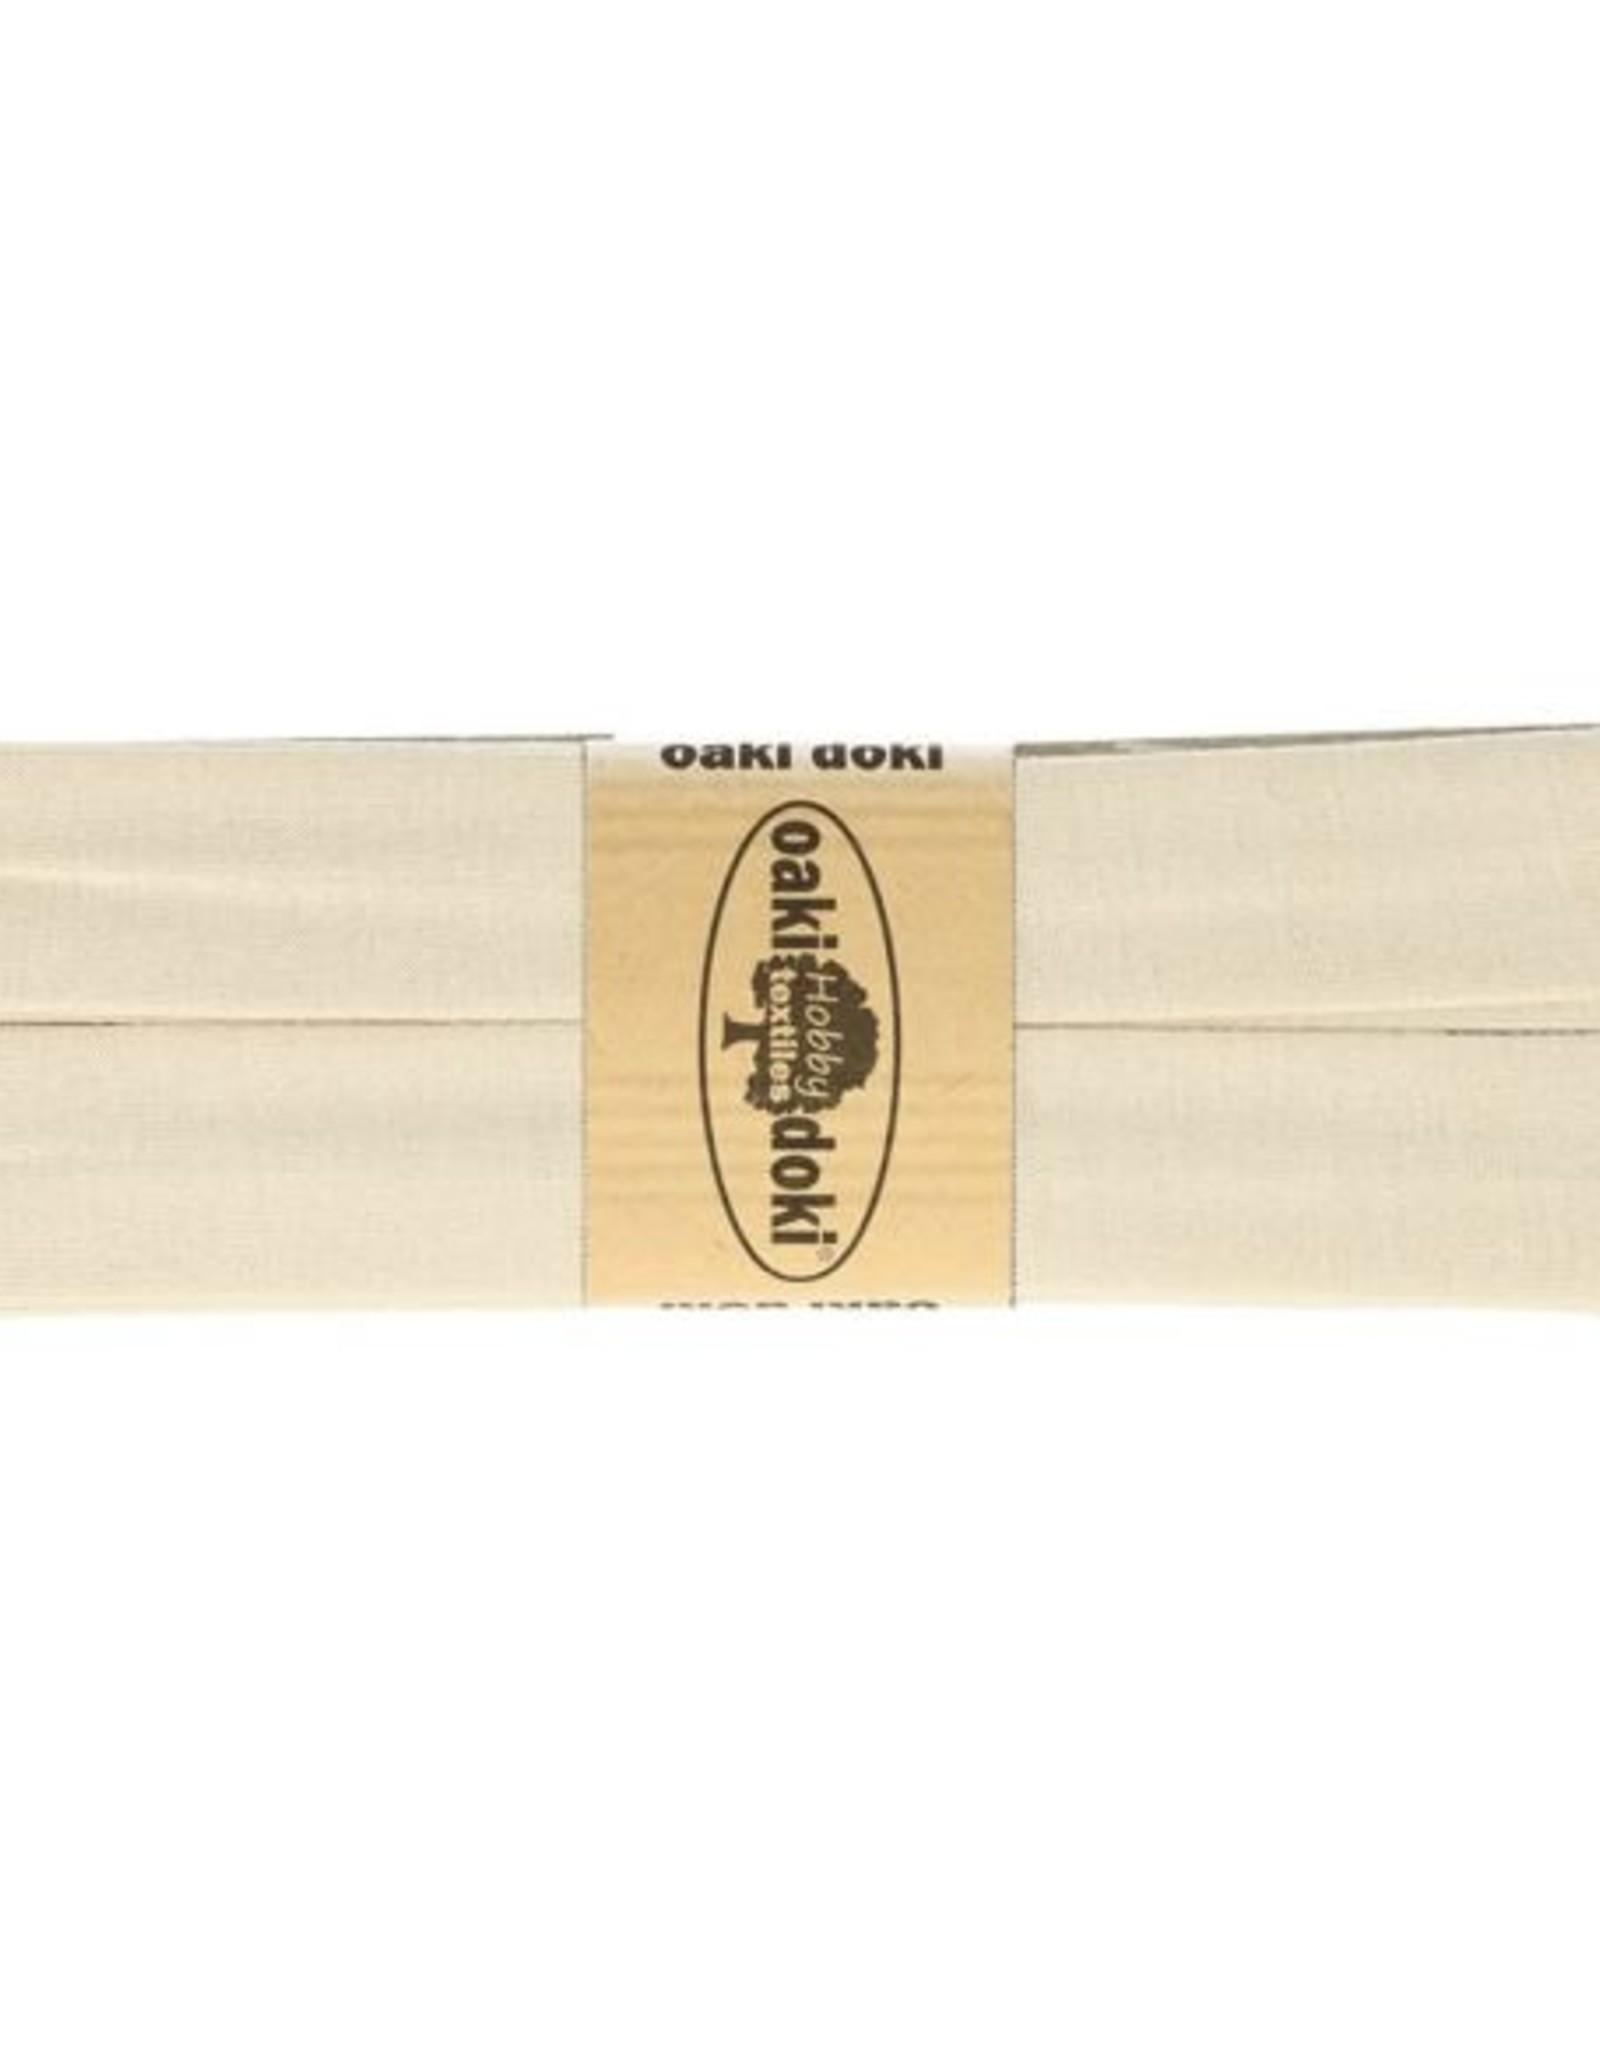 Oaki Doki Tricot de luxe jersey biaisband 20mm x 3m 053